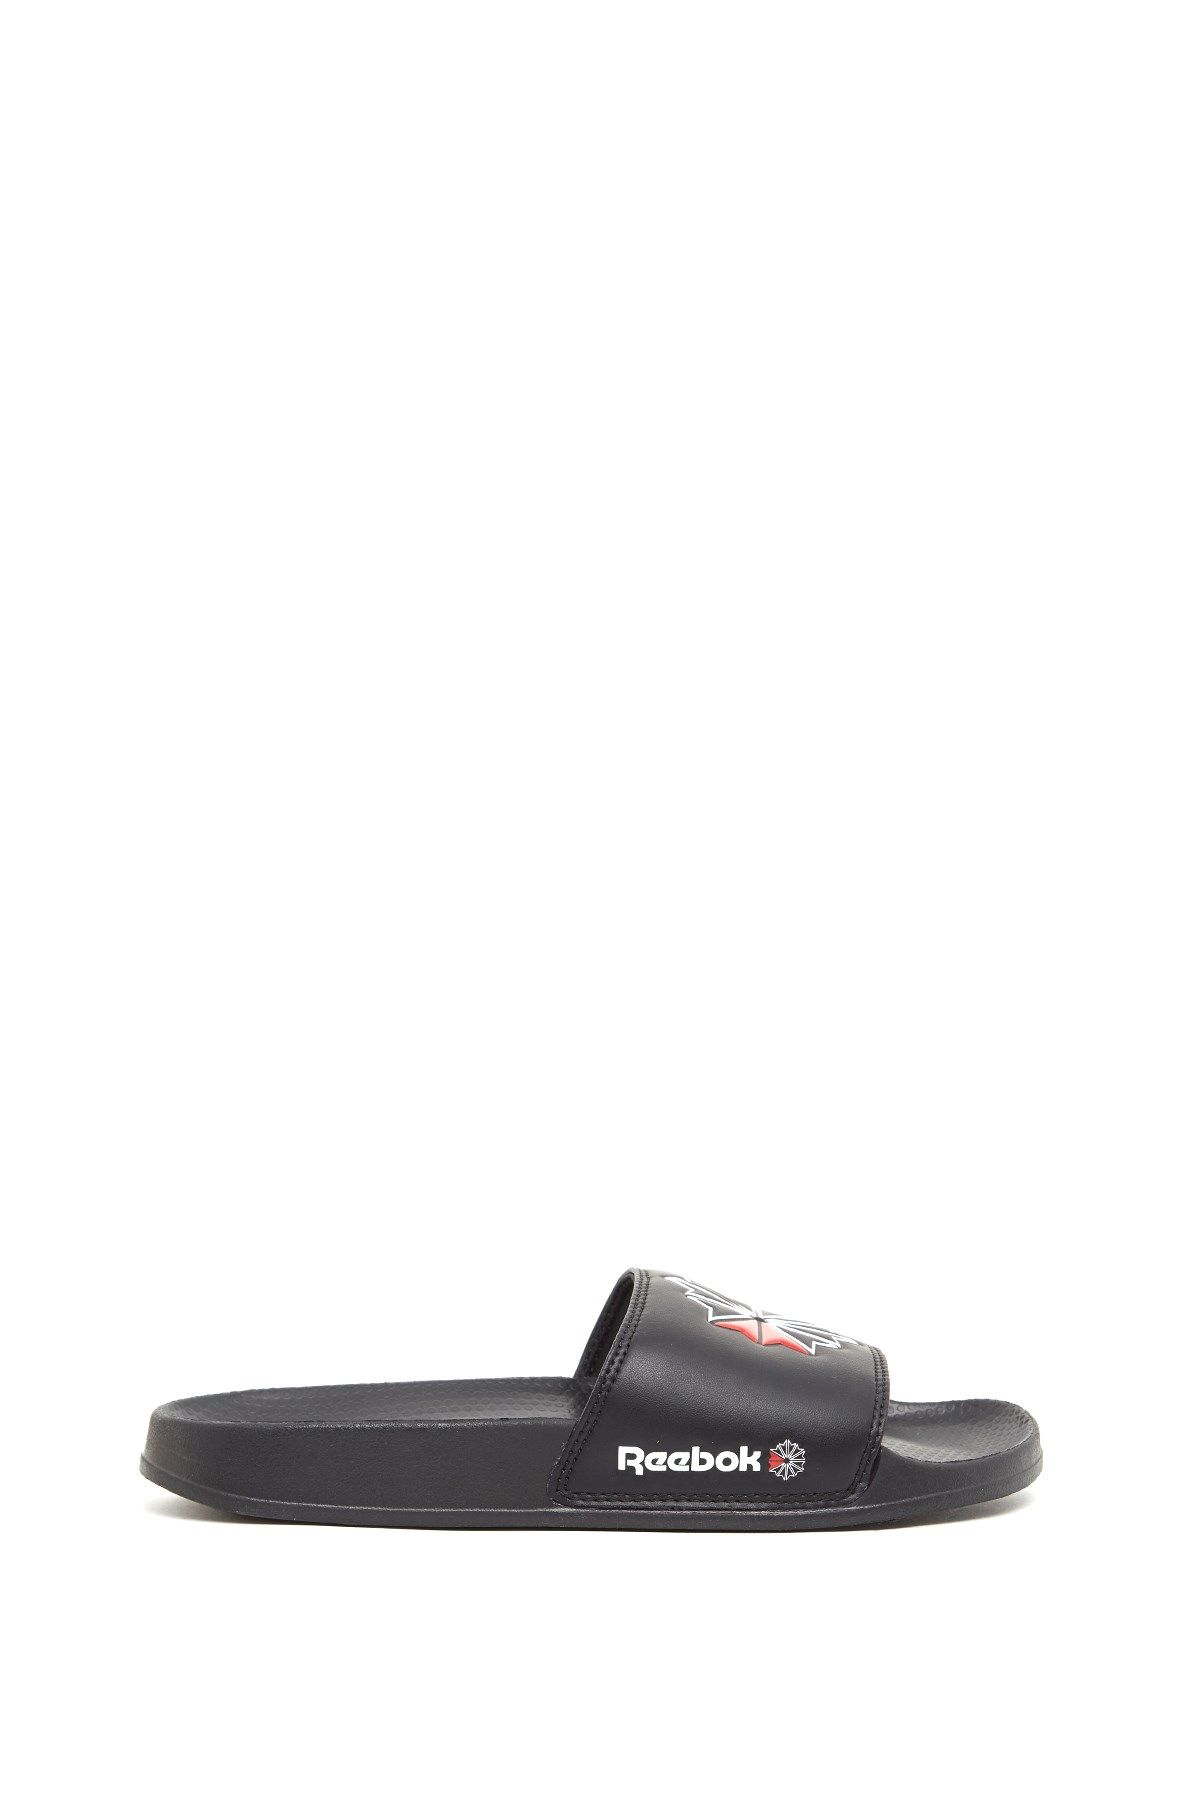 8fa53d34b REEBOK classic slides.  reebok  shoes